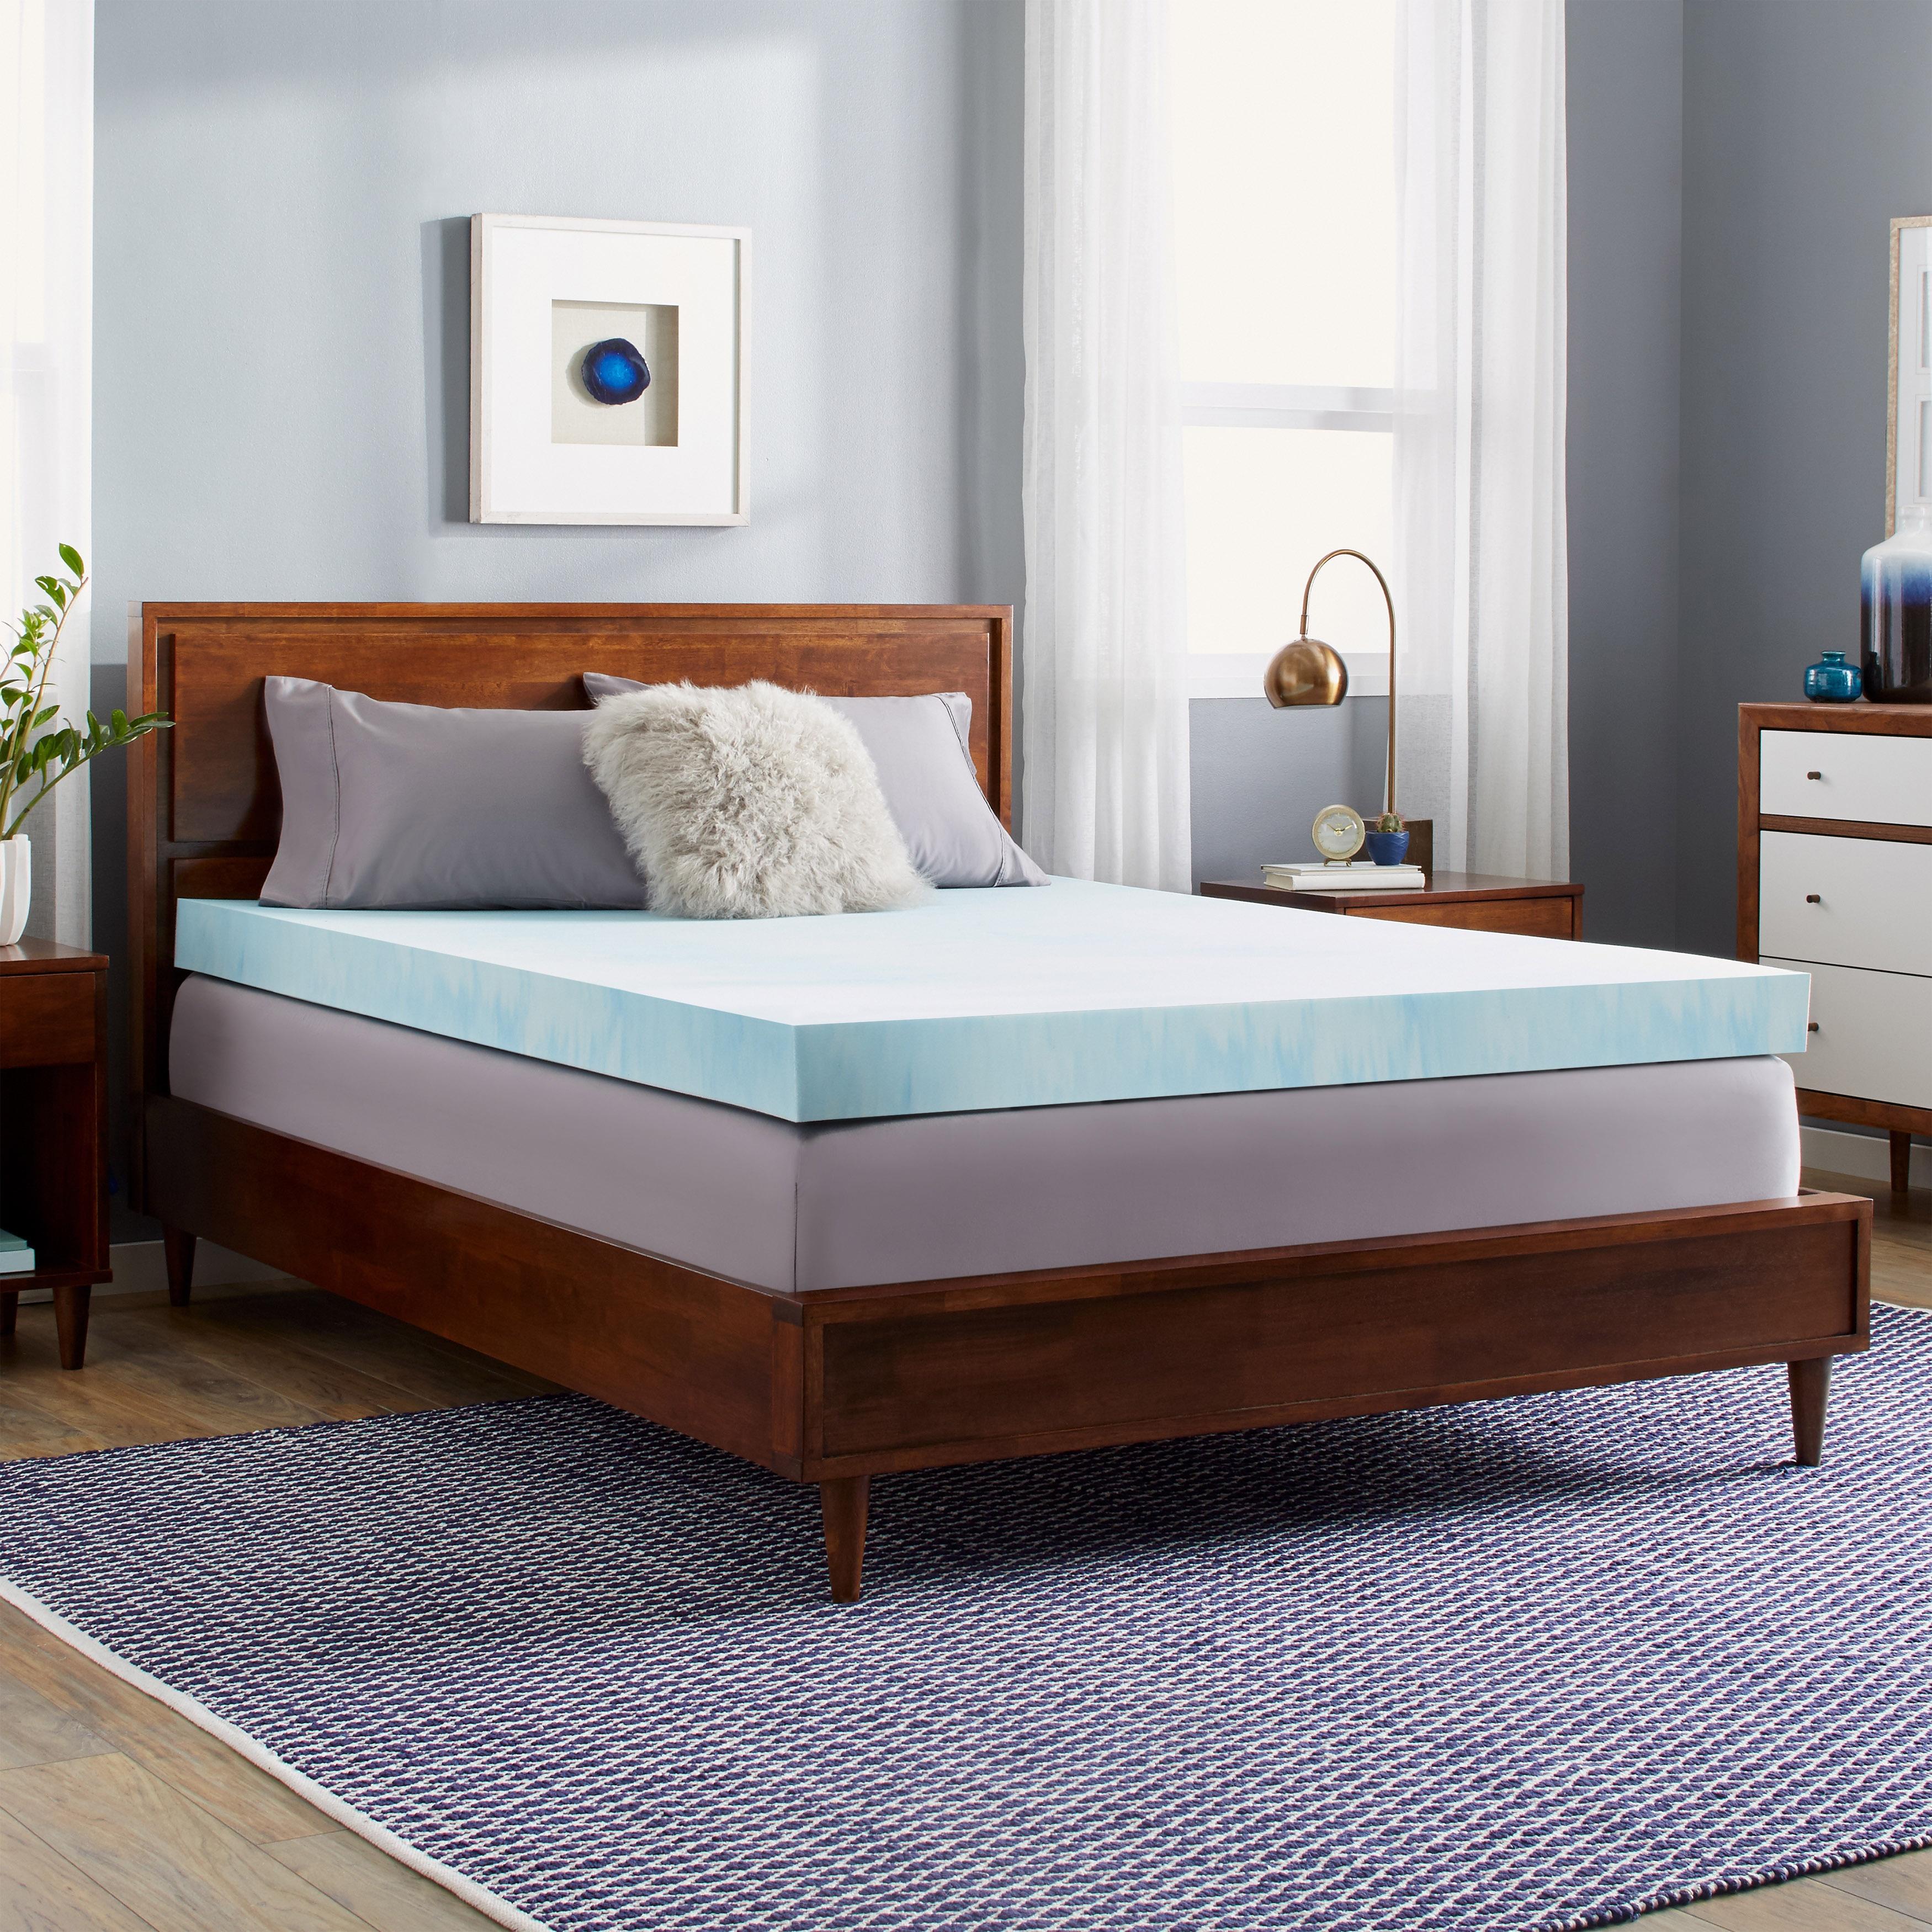 Shop Slumber Solutions Choose Your Comfort 4 Inch Gel Memory Foam